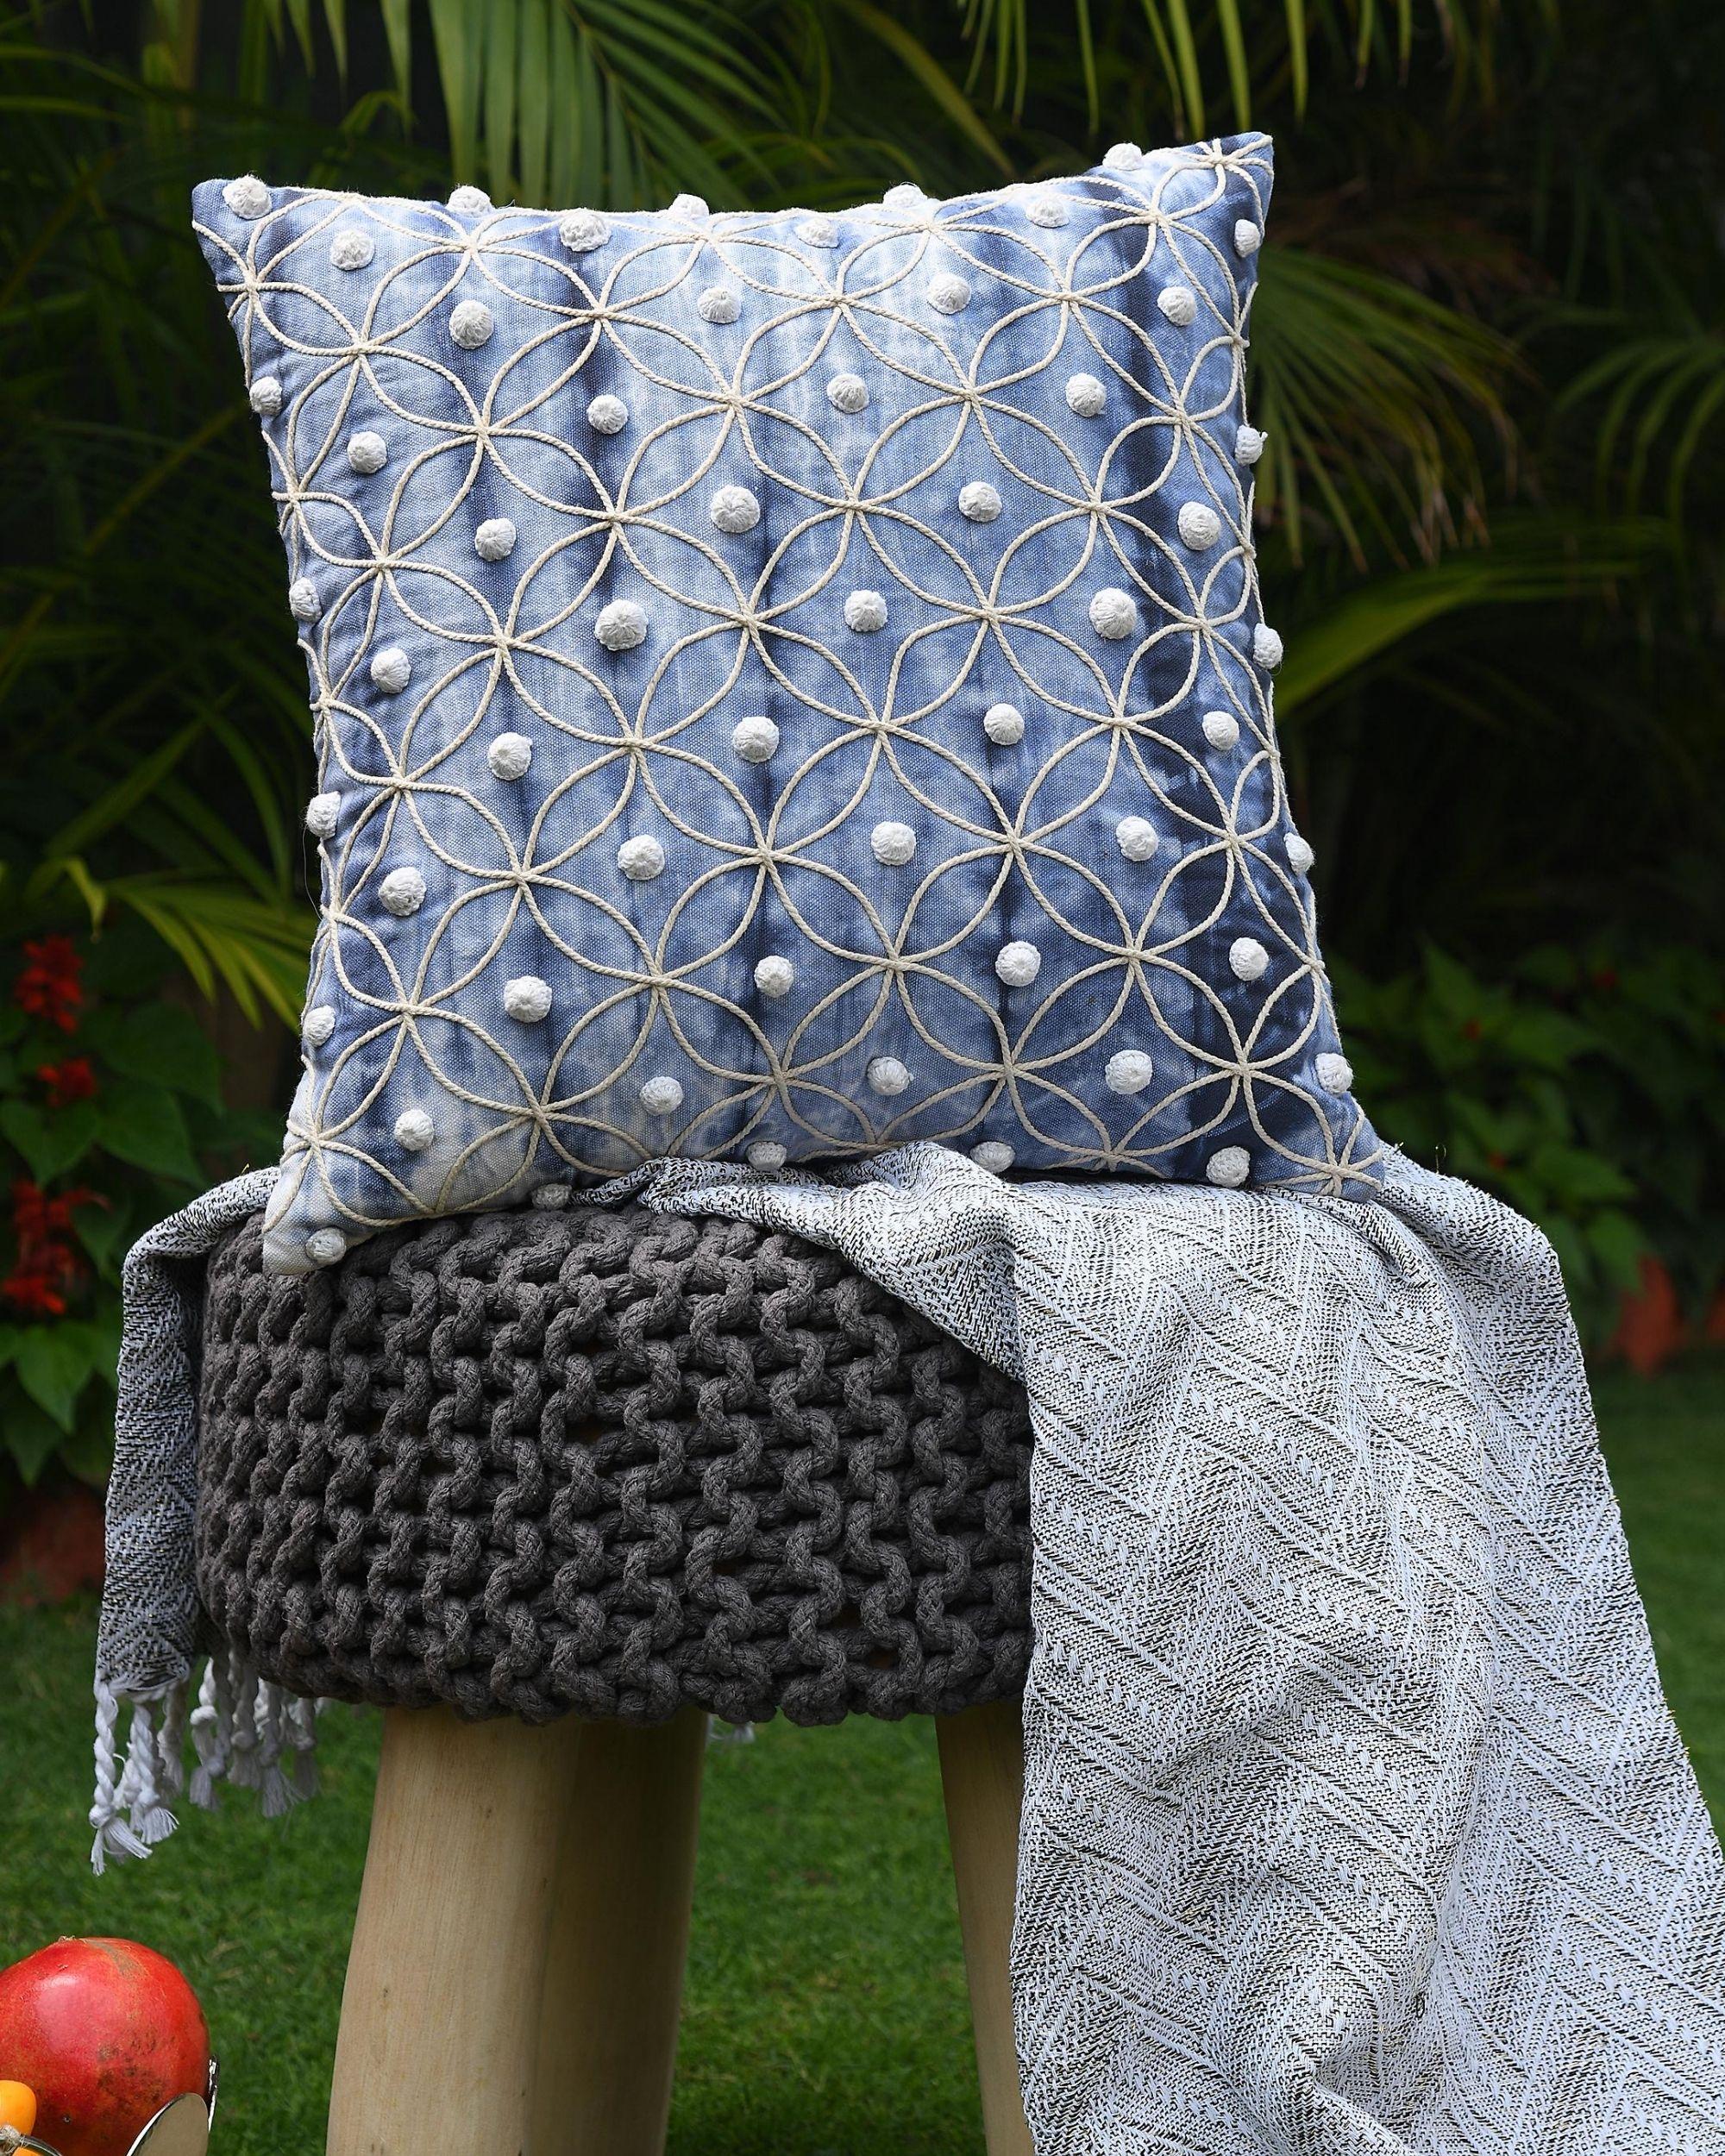 Shibori dyed crochet work cushion cover